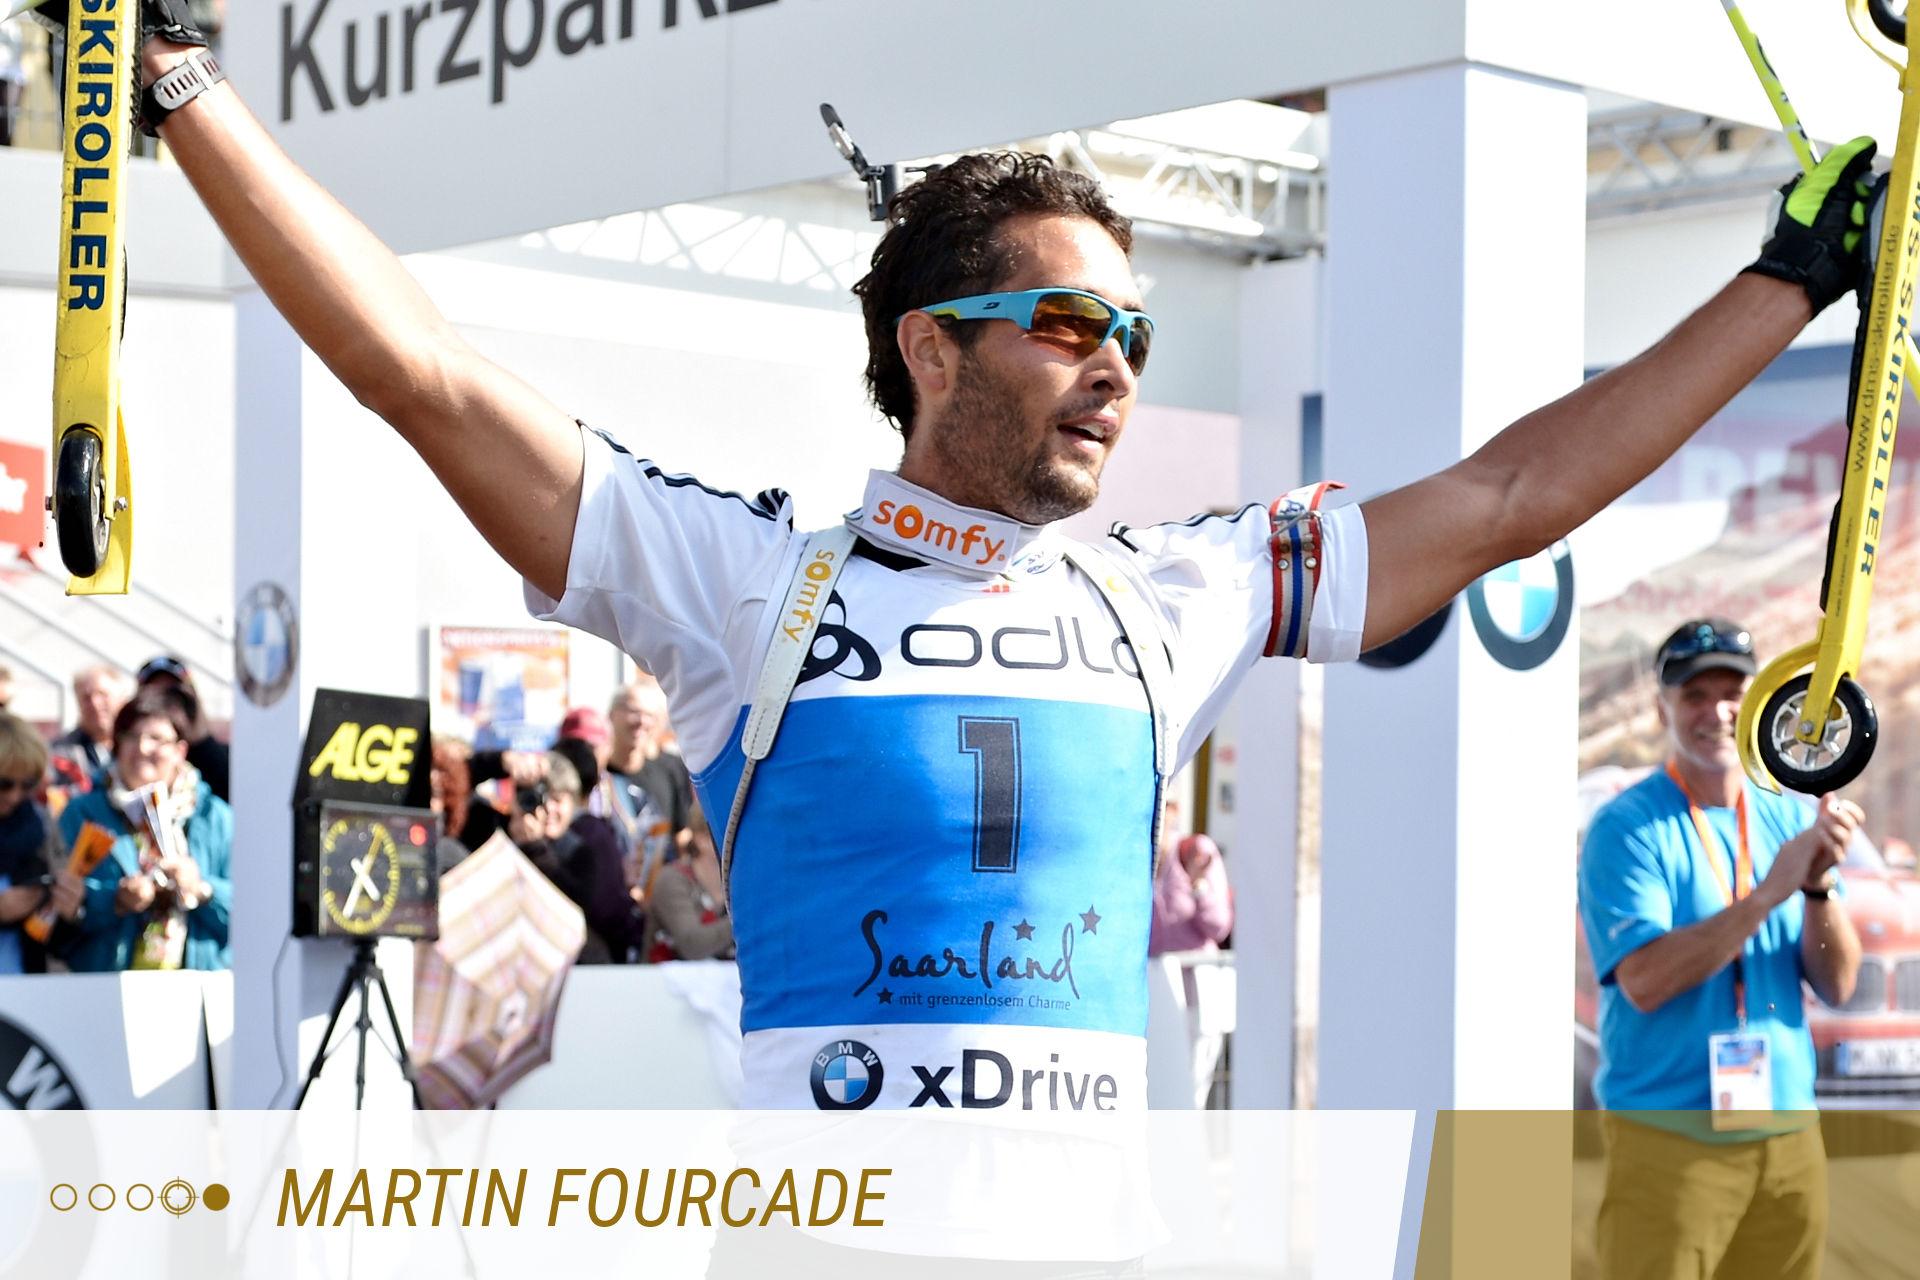 Athleten_Historie_MartinFourcade